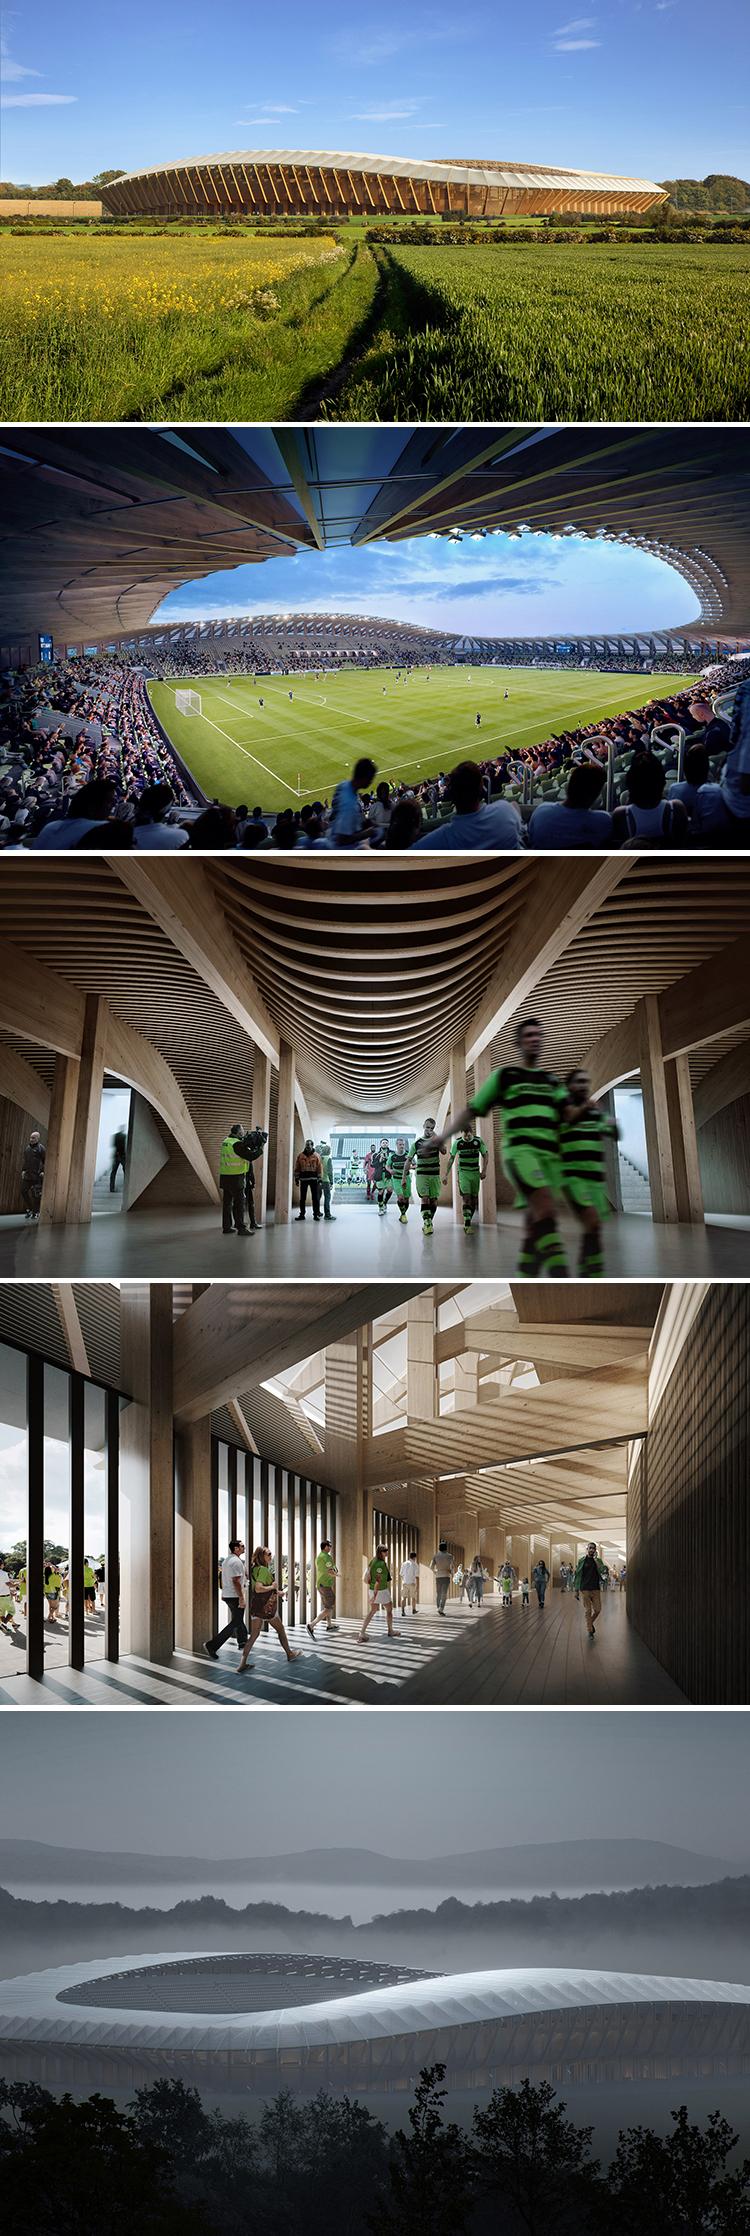 Figuras 10-14. Zaha Hadid architects, estadio de madera para los Forest Green Rovers.